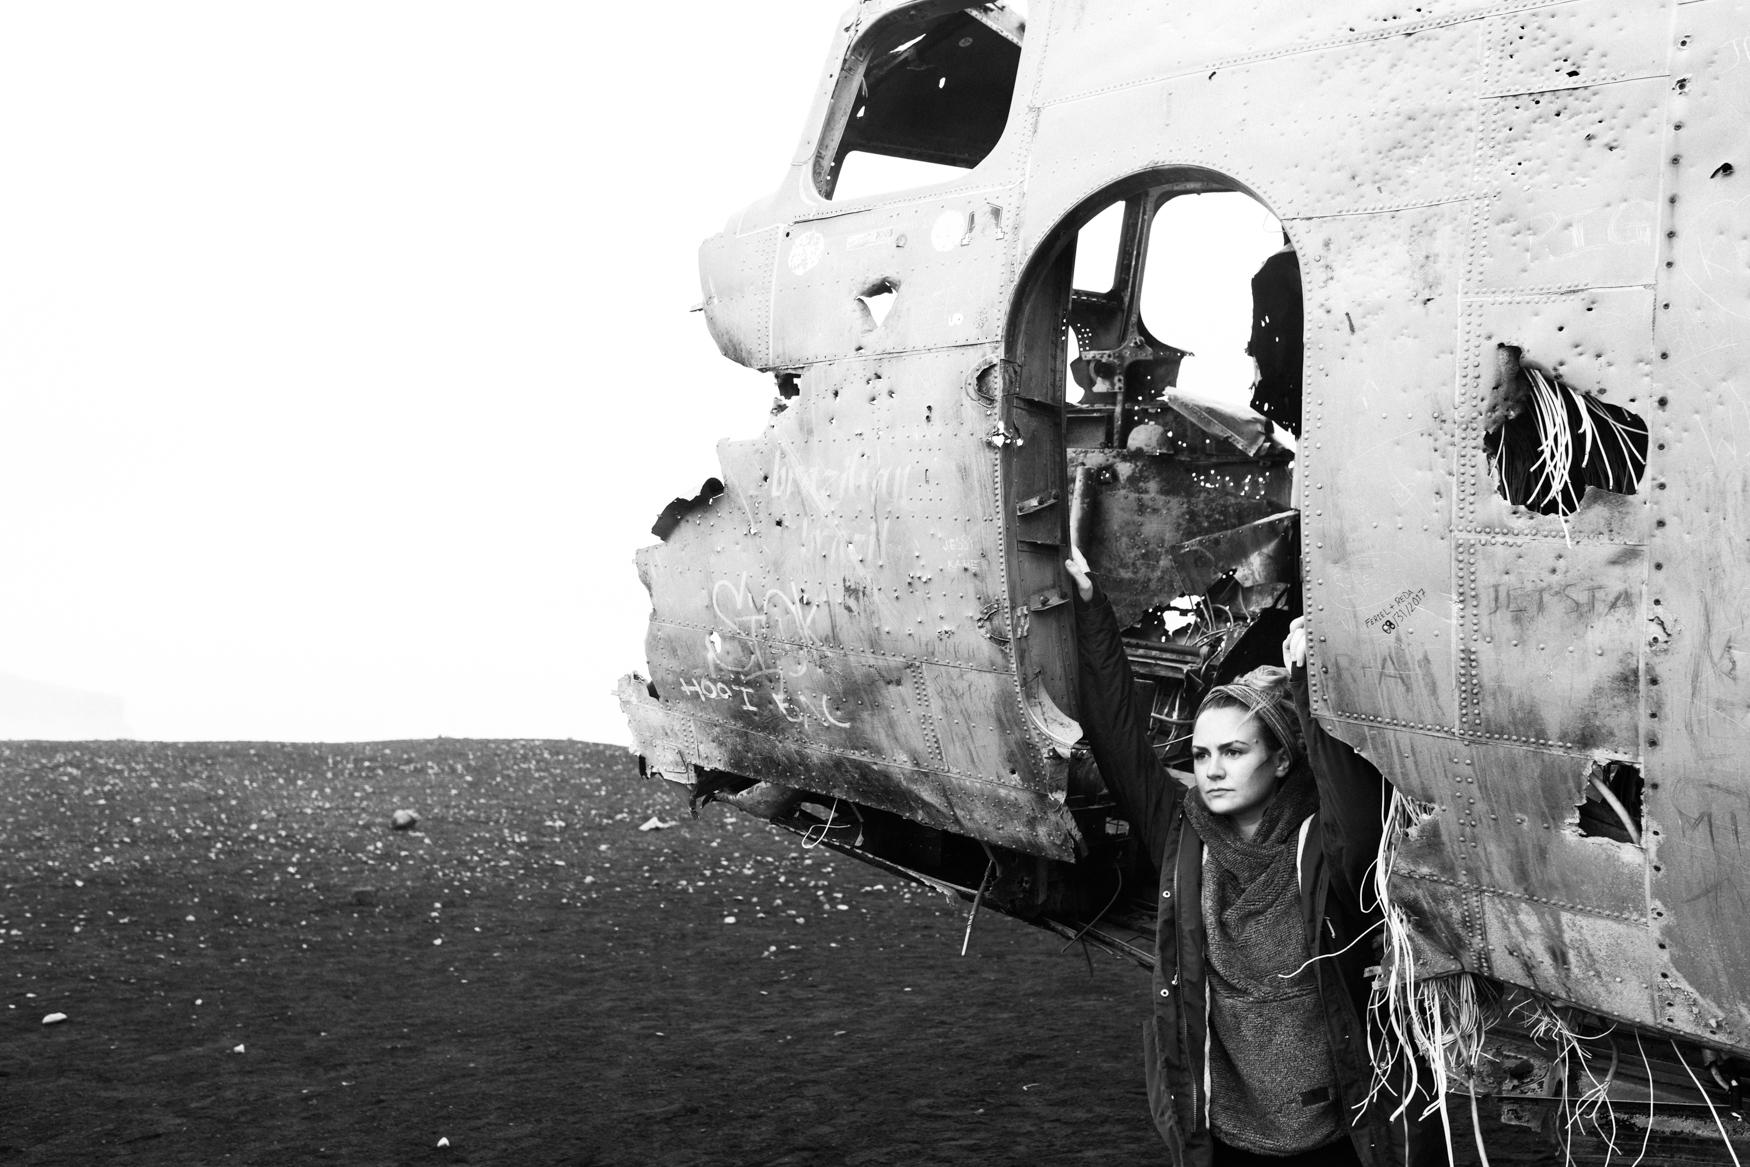 Alex_Sedgmond_Iceland-94.JPG